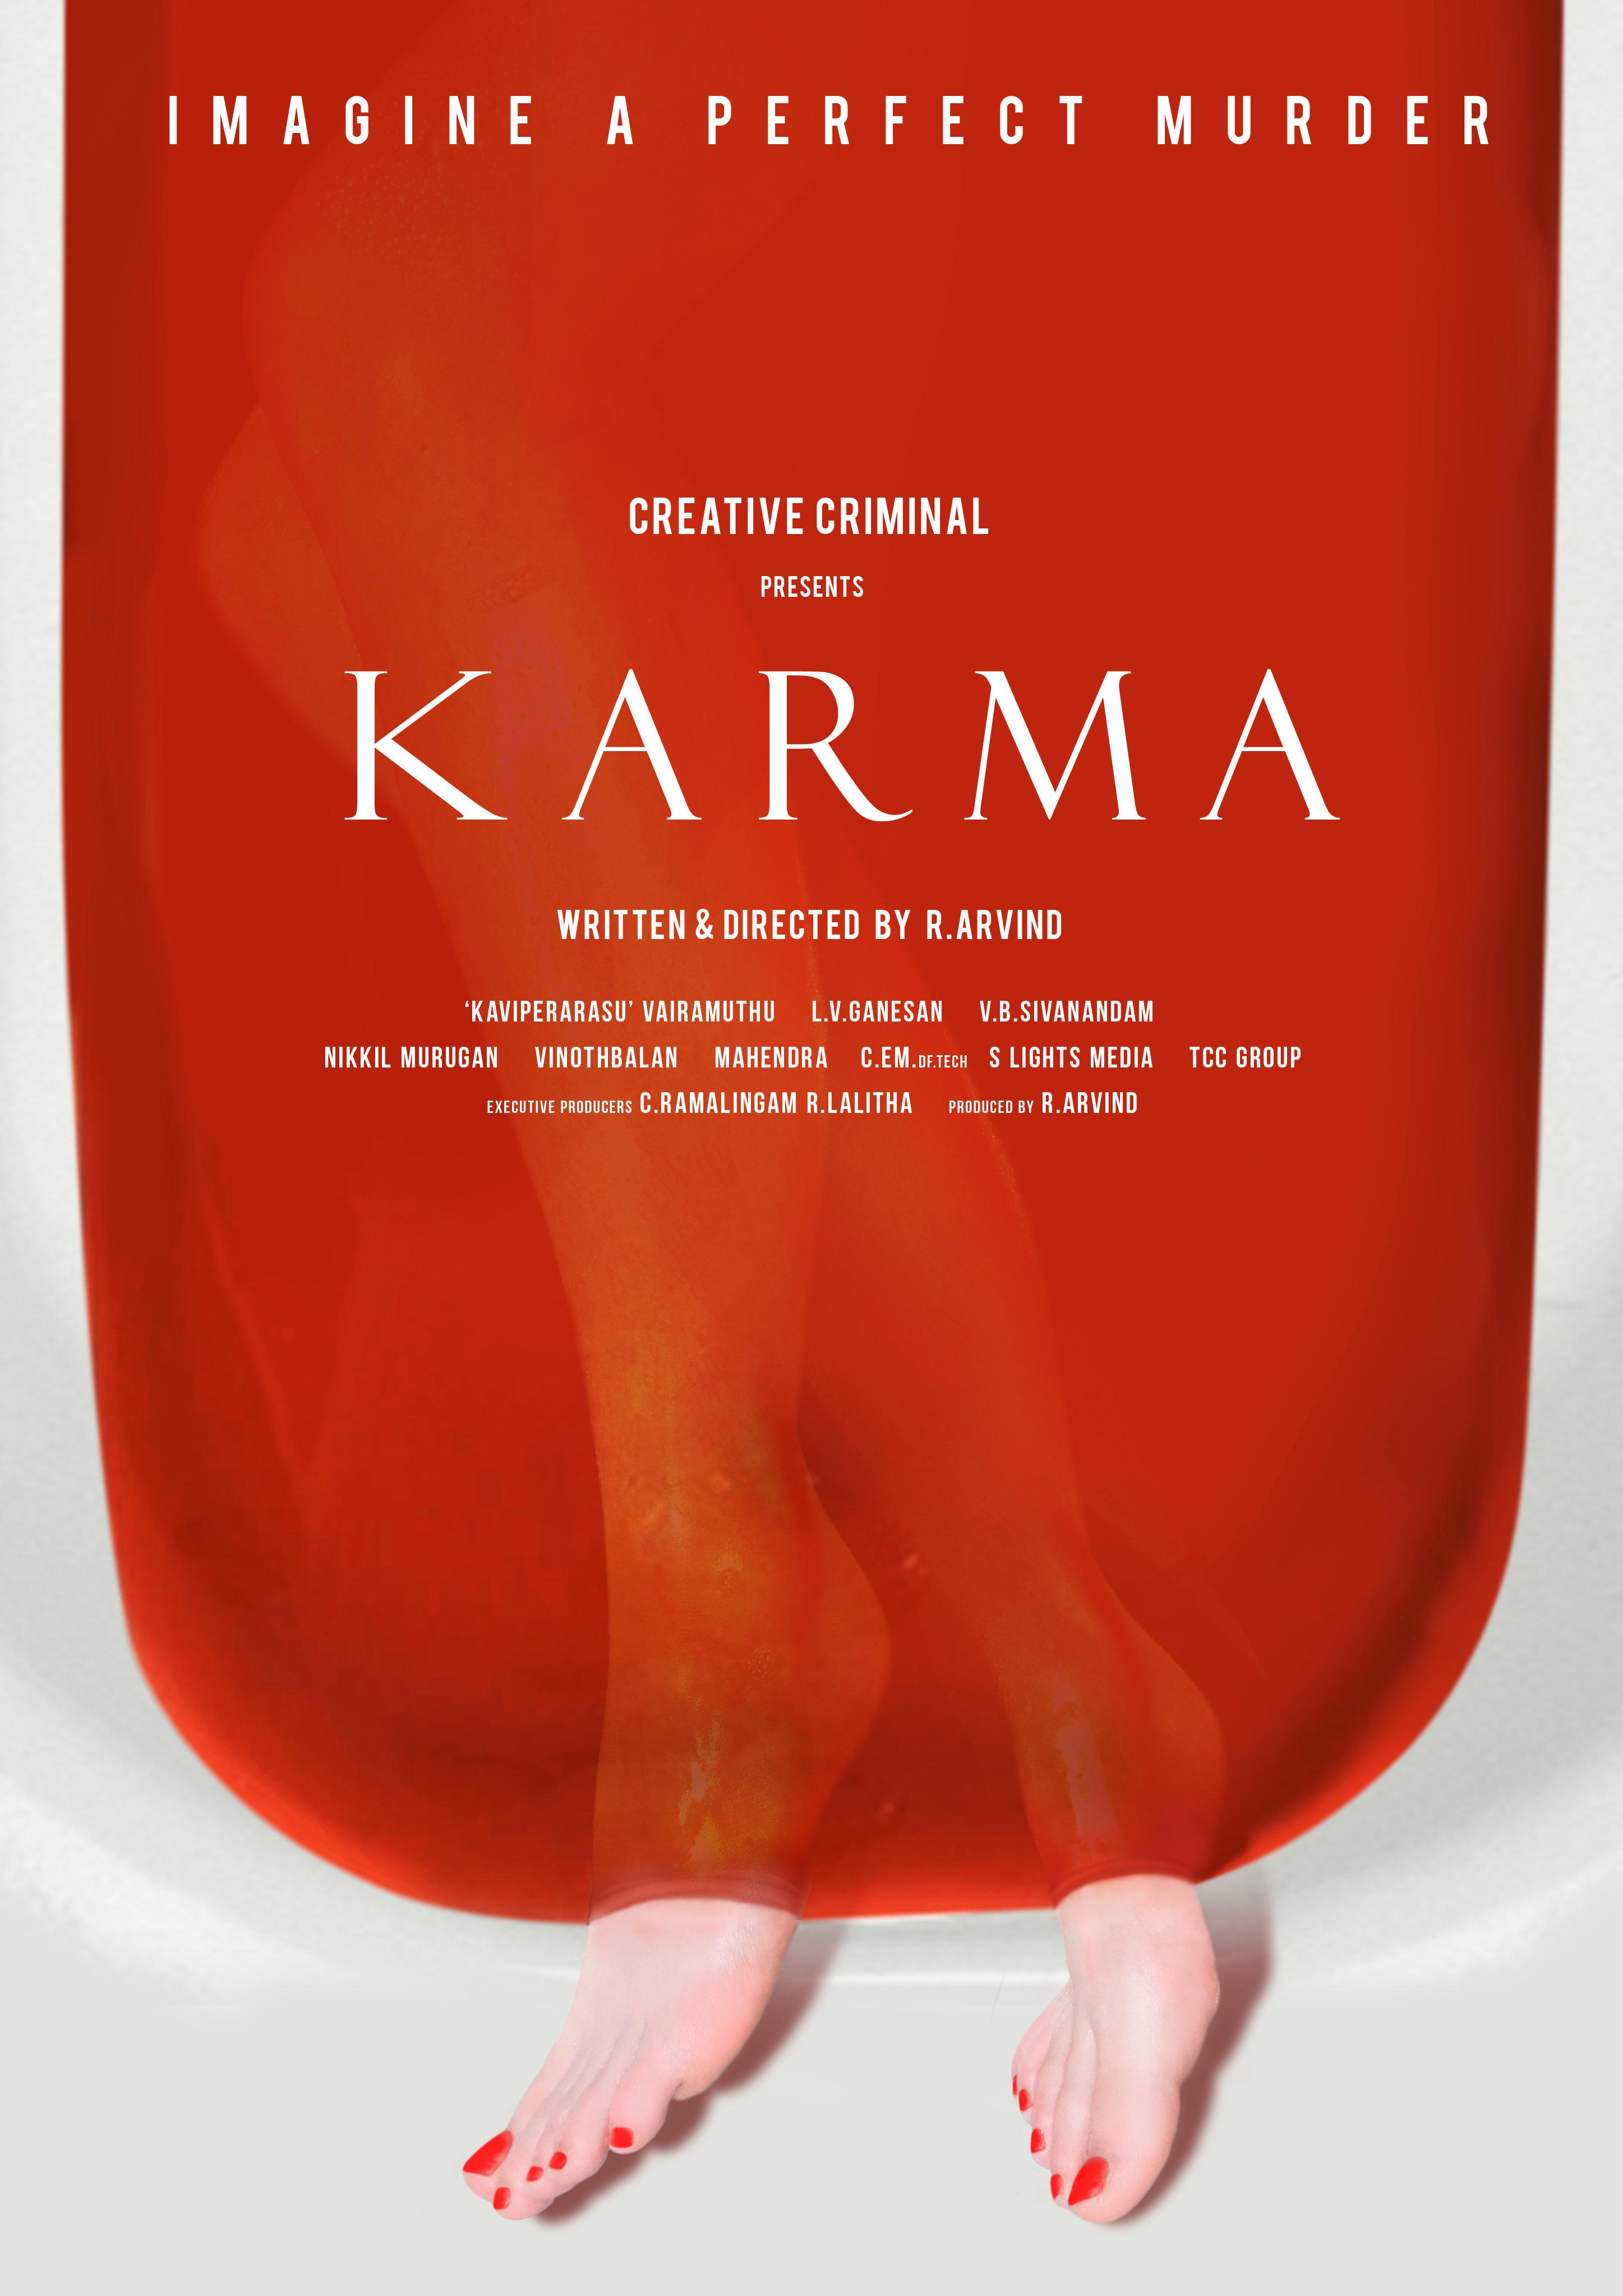 Karma 2015 Imdb